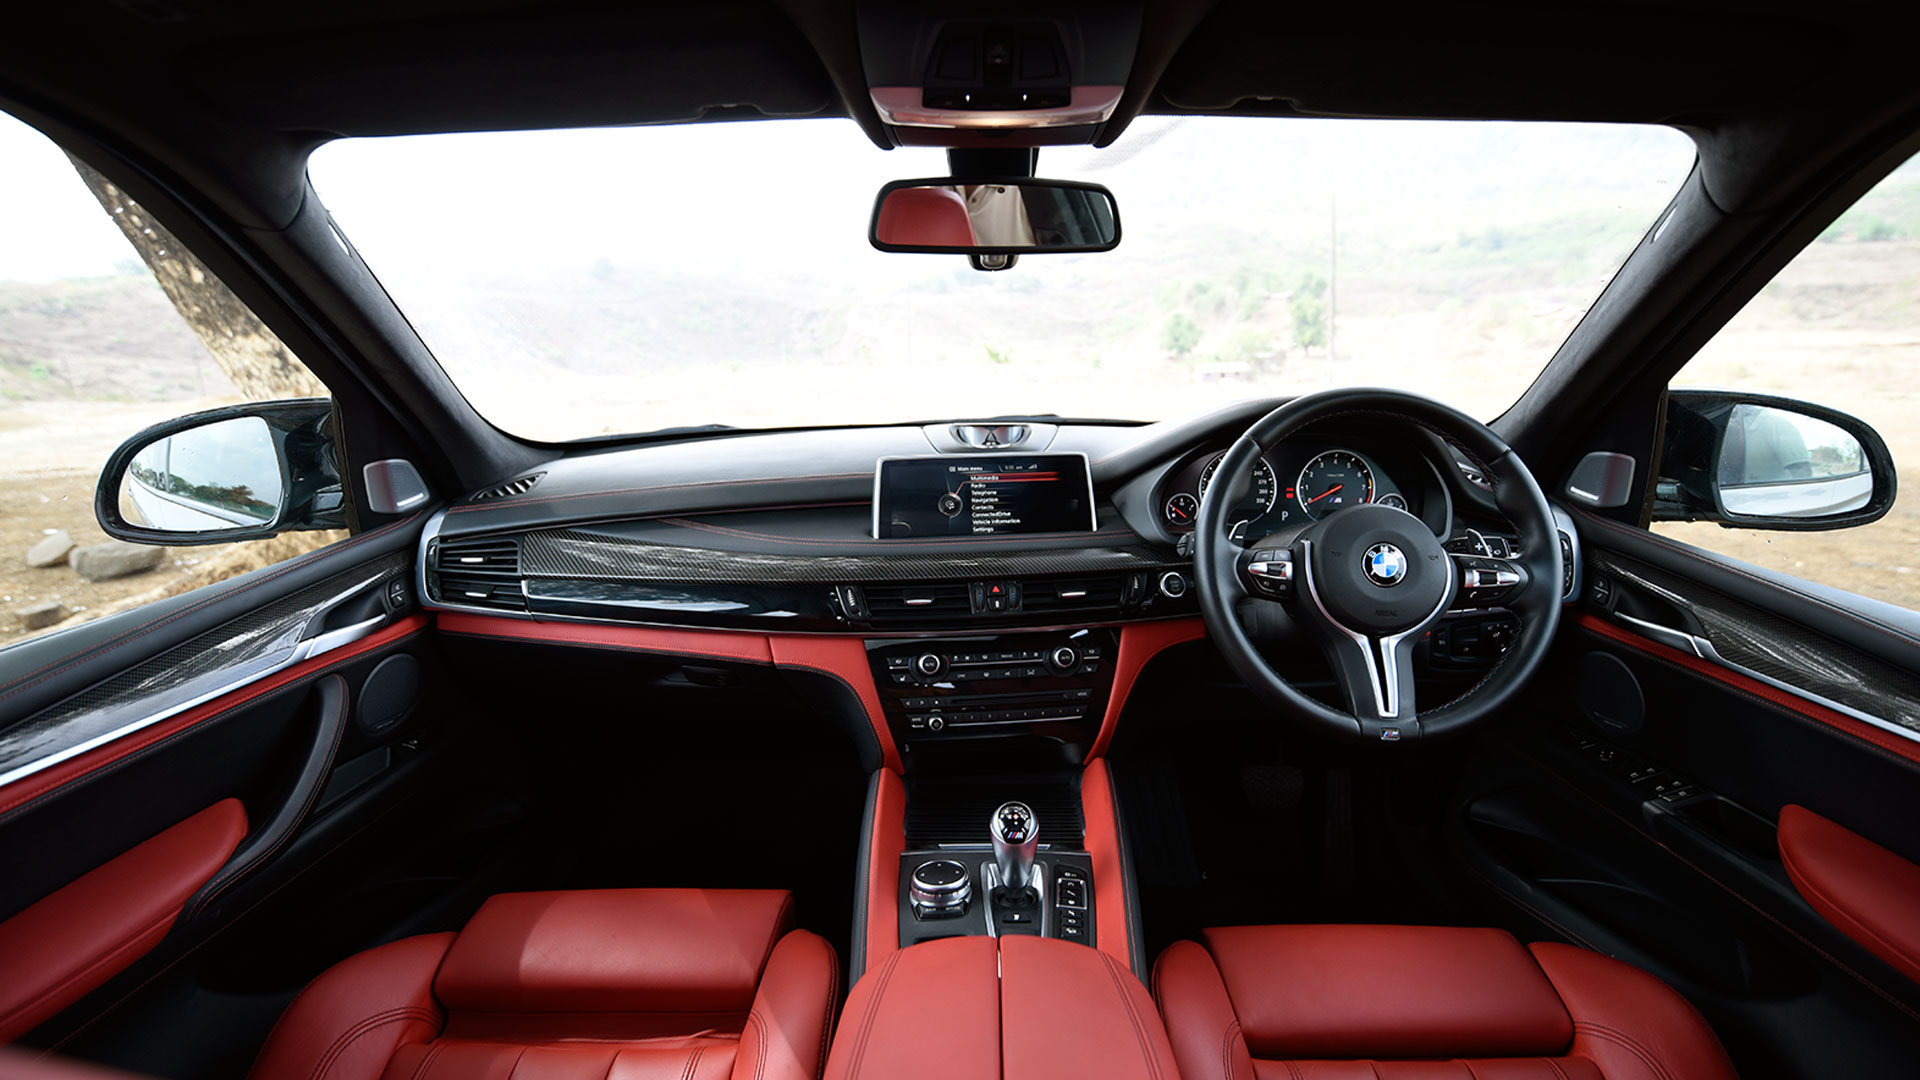 Bmw X5 2015 M Interior Car Photos Overdrive